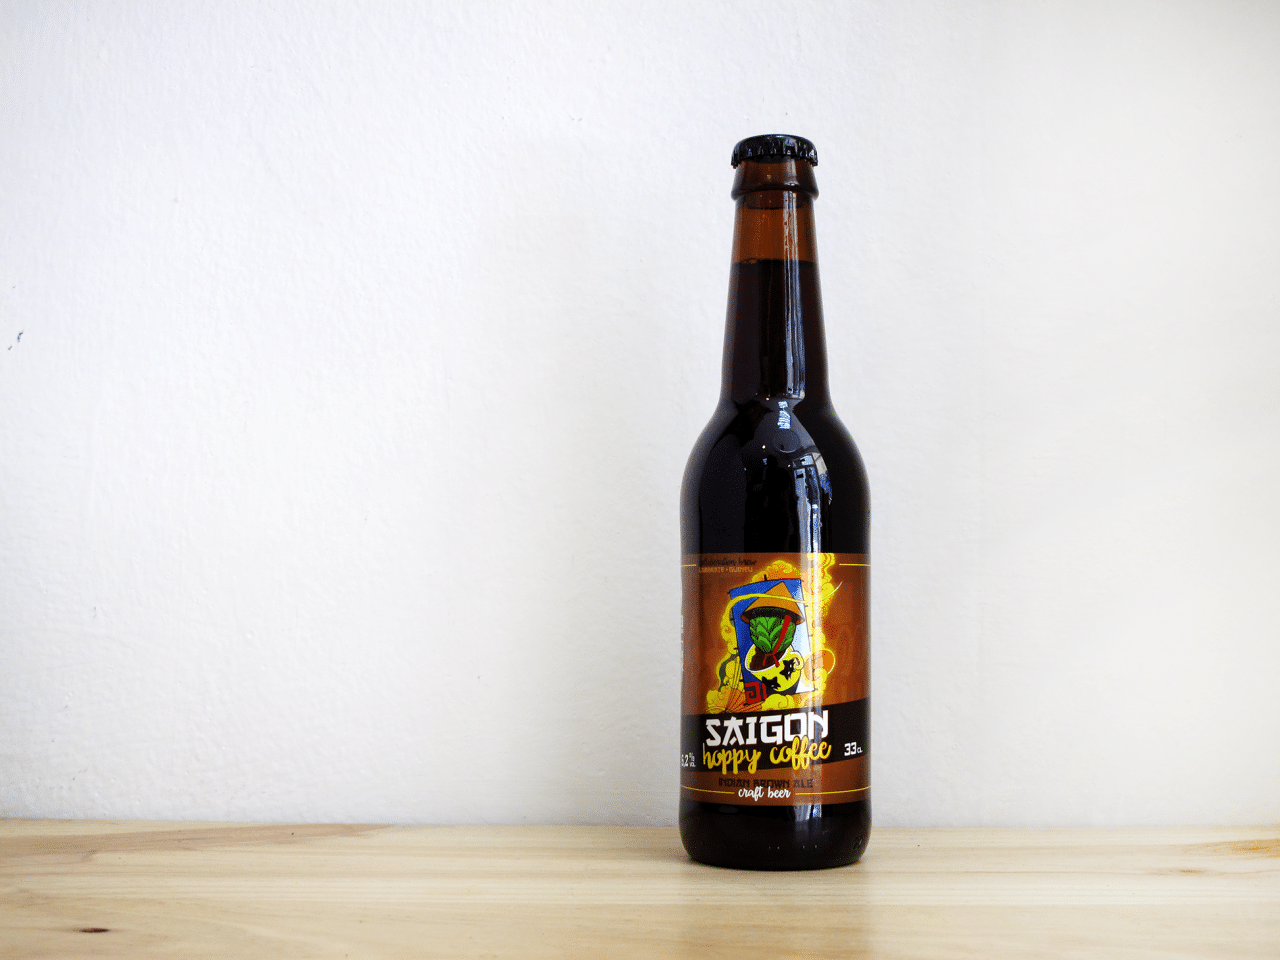 Cerveza Guineu - Lambrate Saigon Hopppy Coffe - American Brown Ale